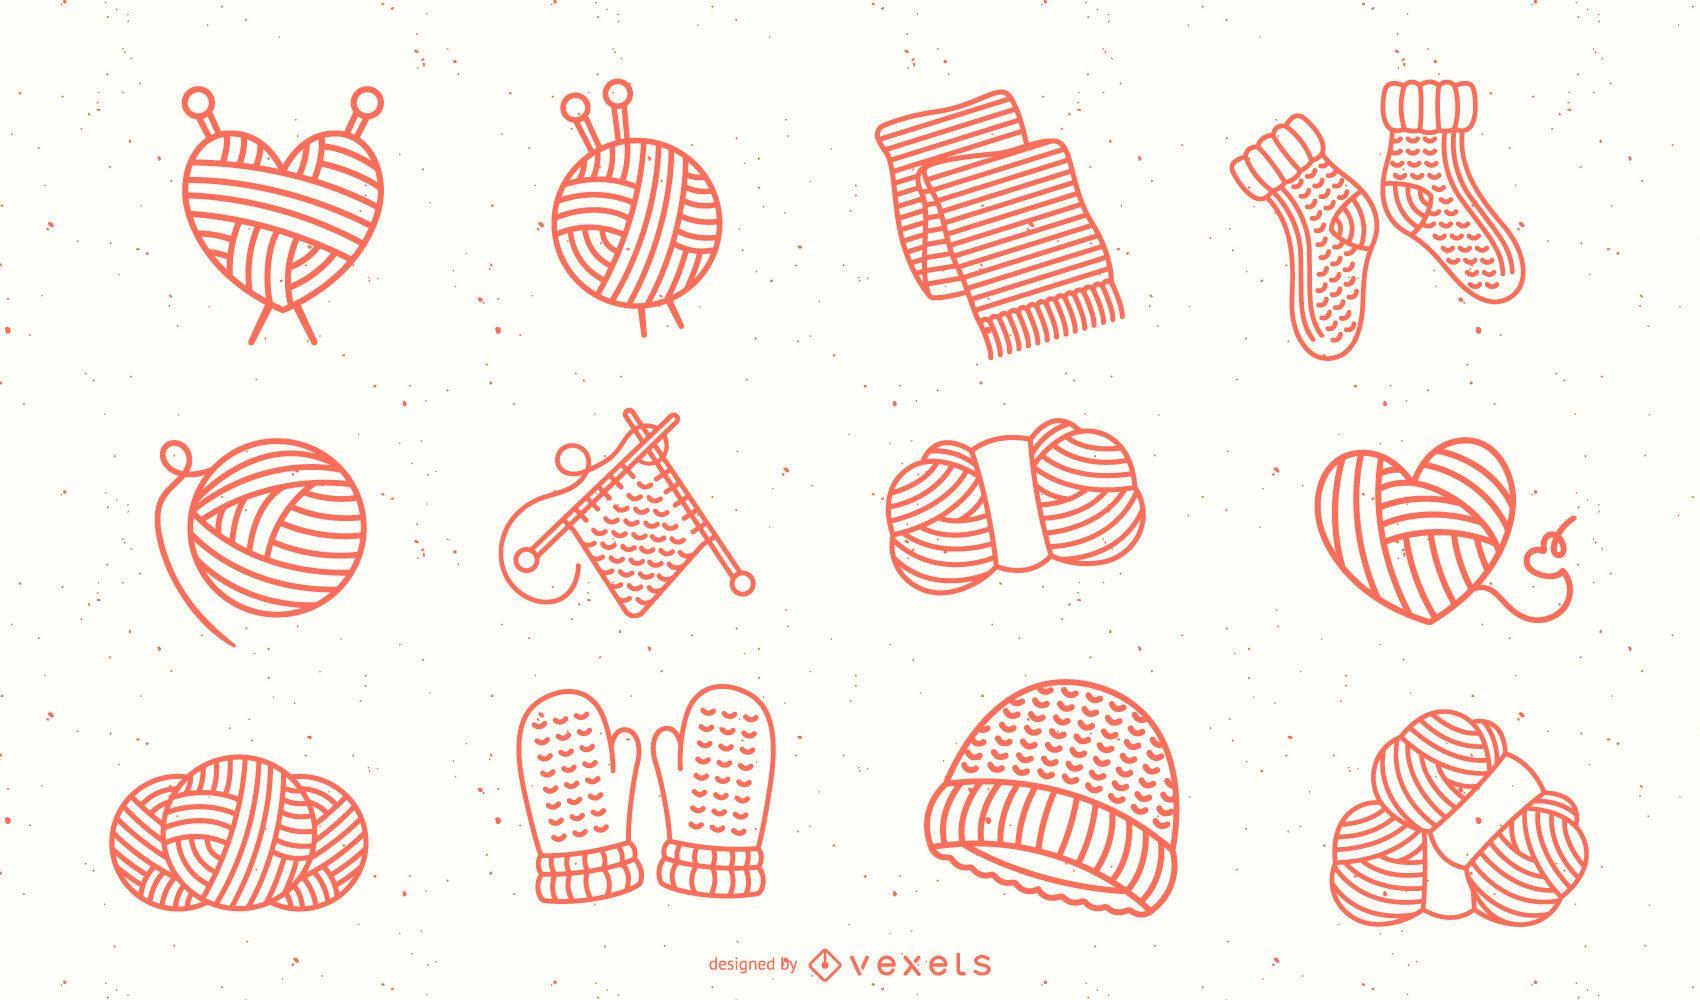 Colección de trazos de elementos de lana